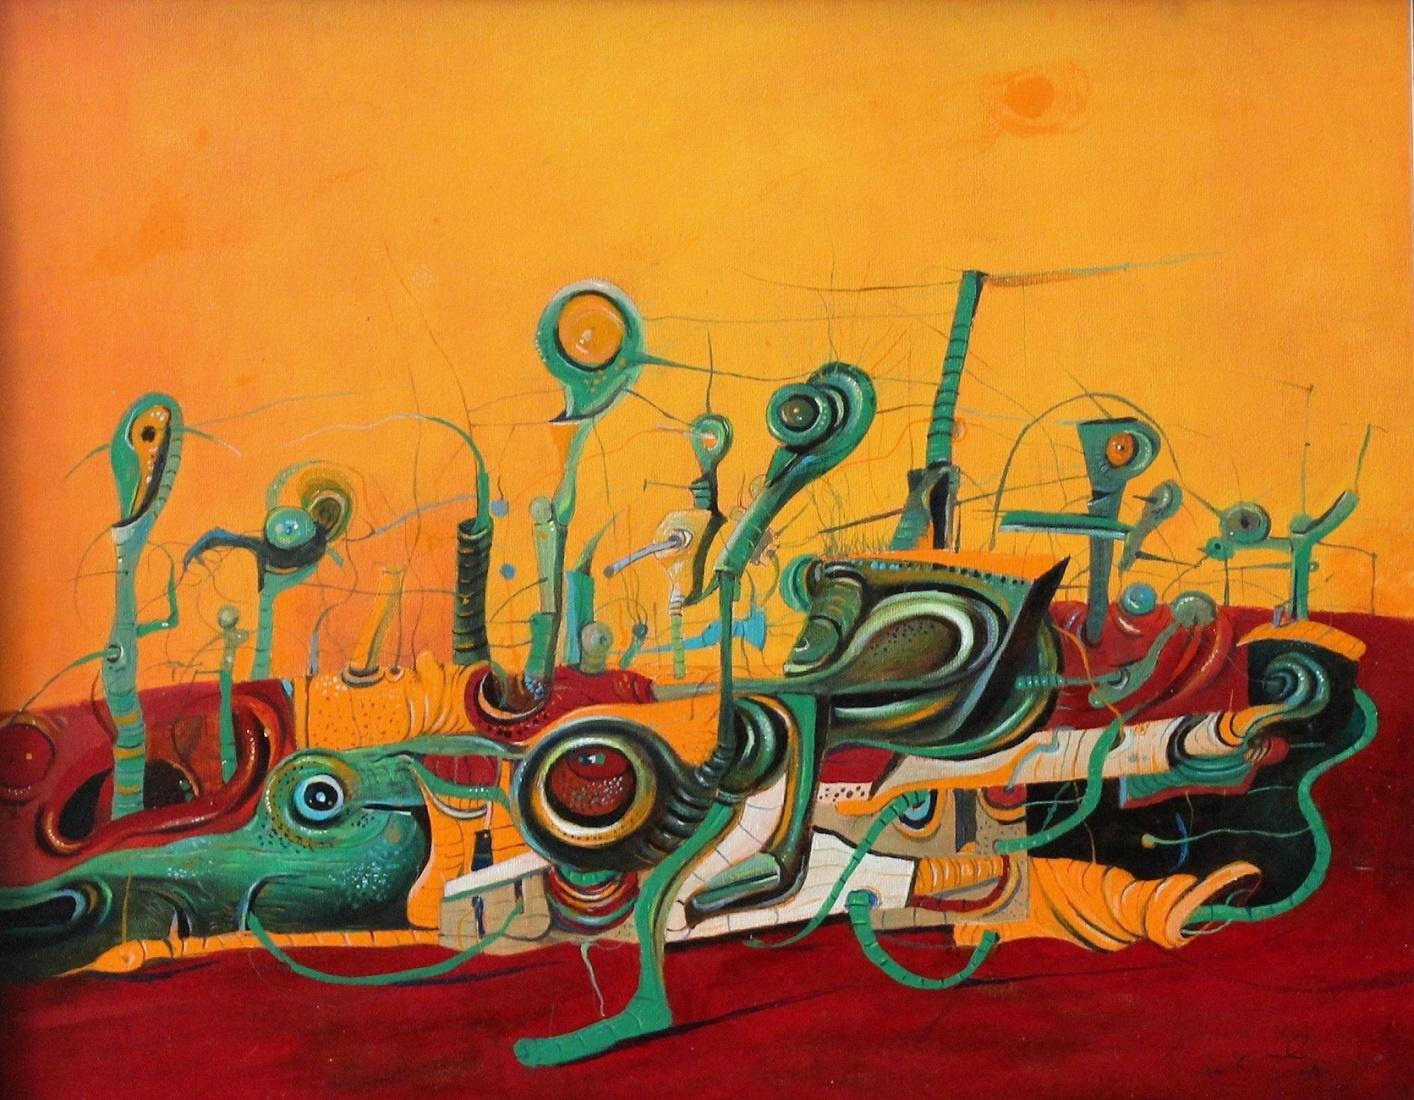 Orange composition -  XXI Century, Contemporary Surreal Art, Vibrant colors